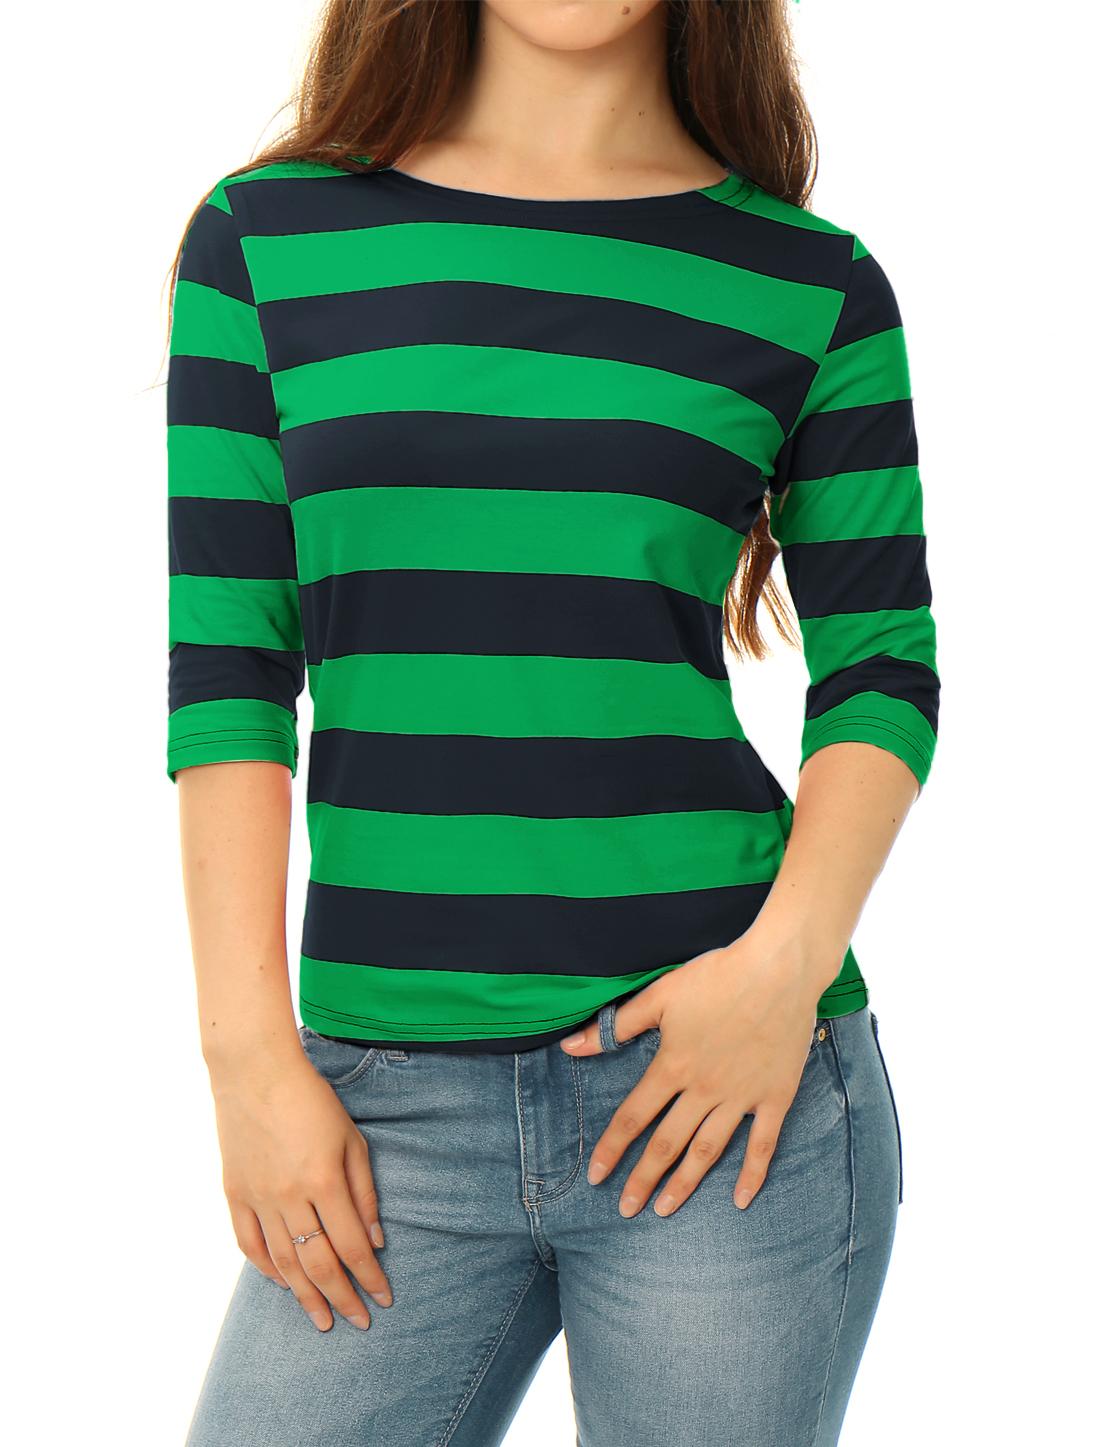 Allegra K Women Half Sleeves Boat Neck Slim Fit Stripe Tee Dark Green L